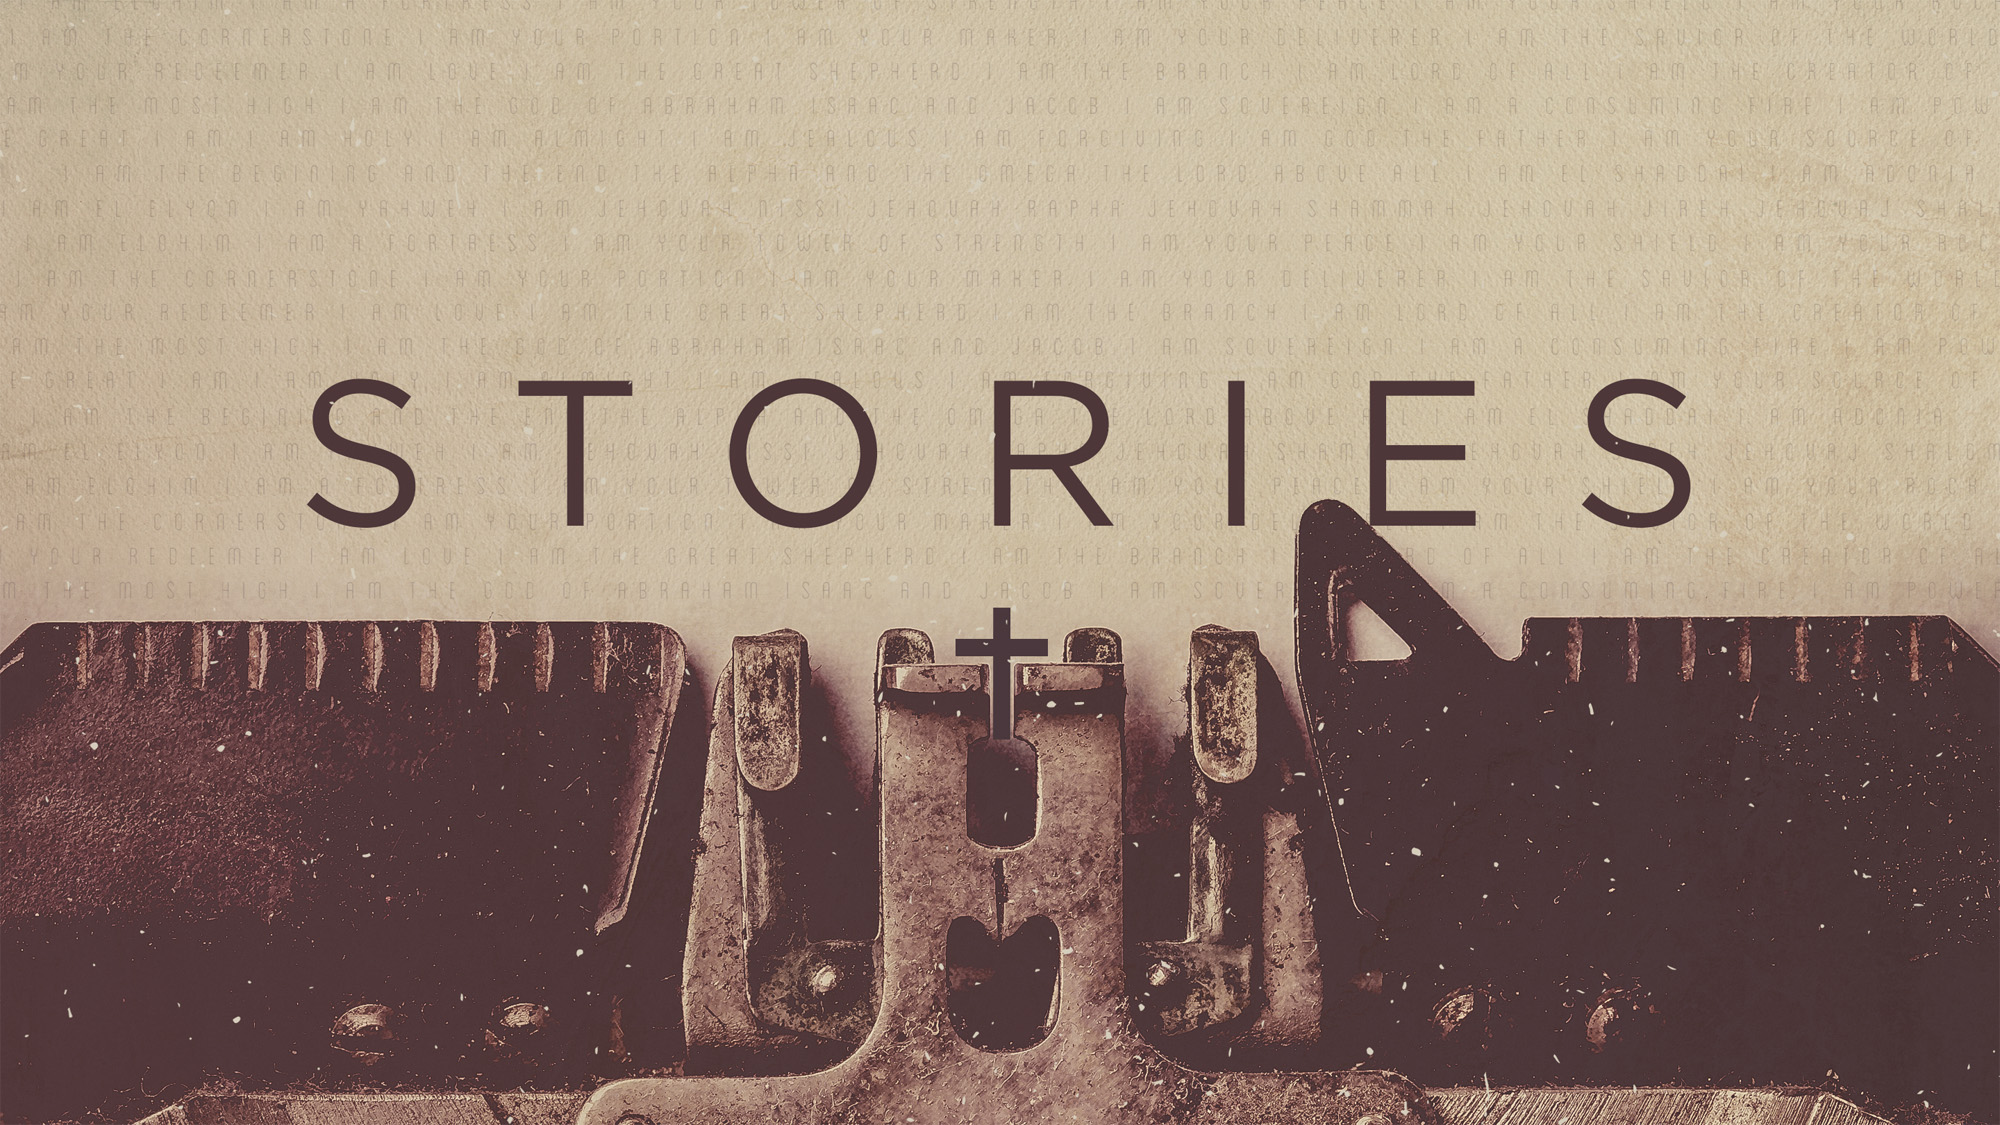 Stories_WIDE-TITLE-1.jpg